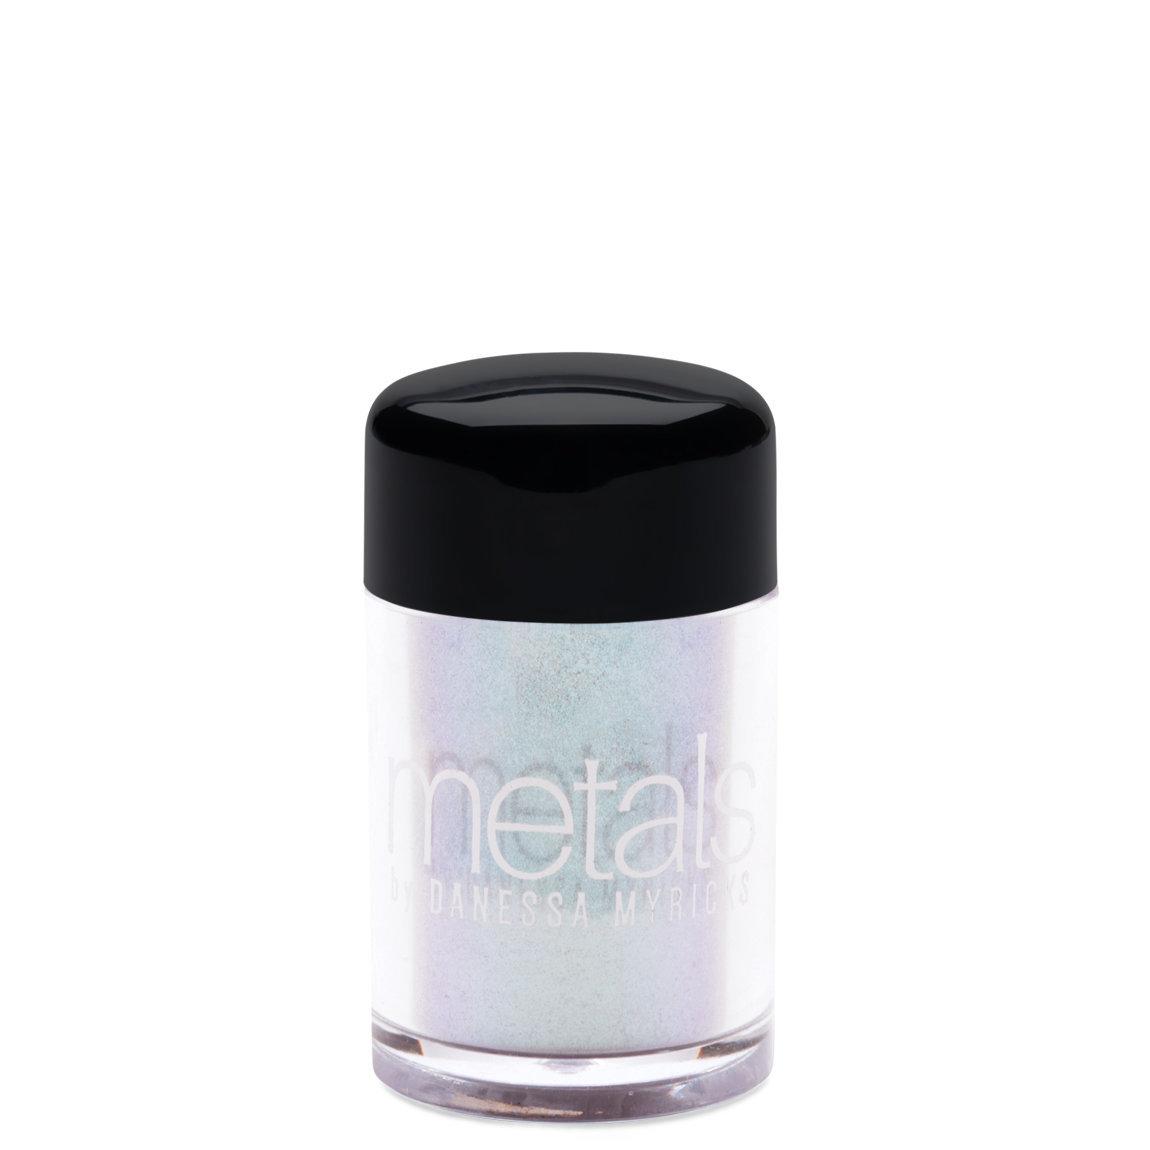 Danessa Myricks Beauty Metals Pigment Daydreaming alternative view 1.